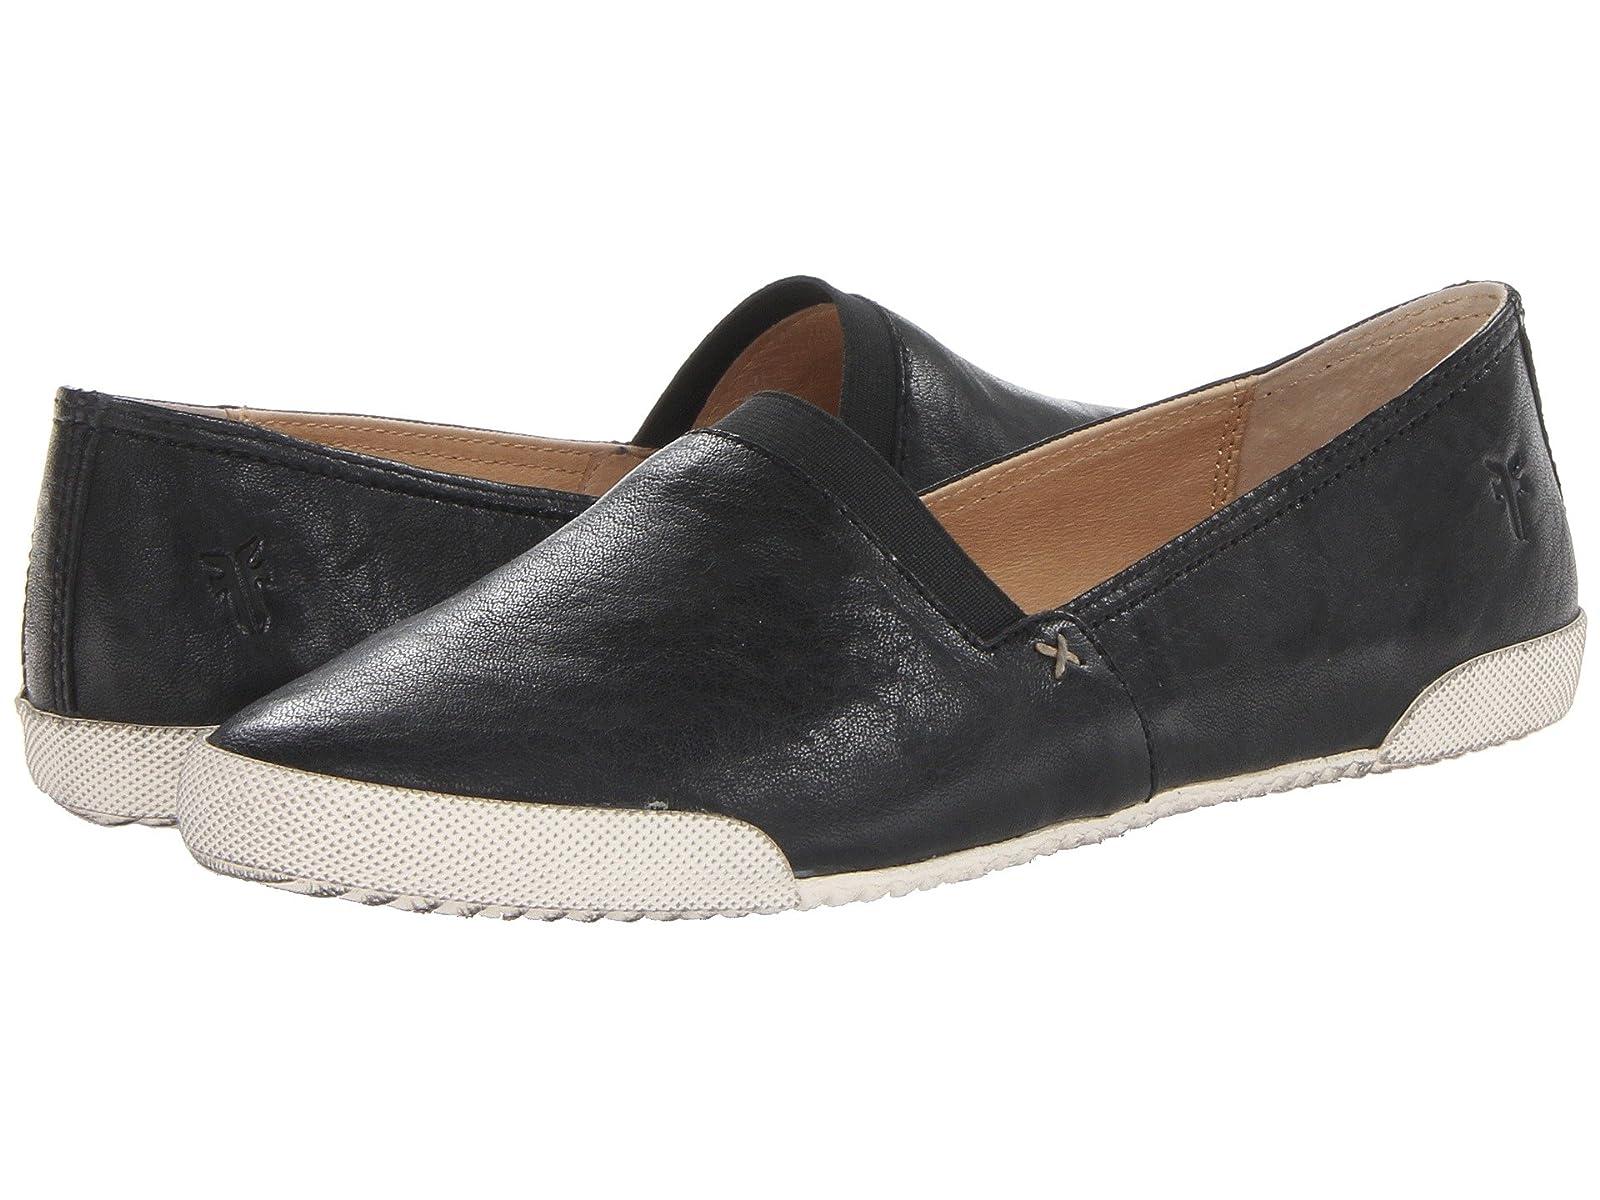 Frye Melanie Slip OnAtmospheric grades have affordable shoes